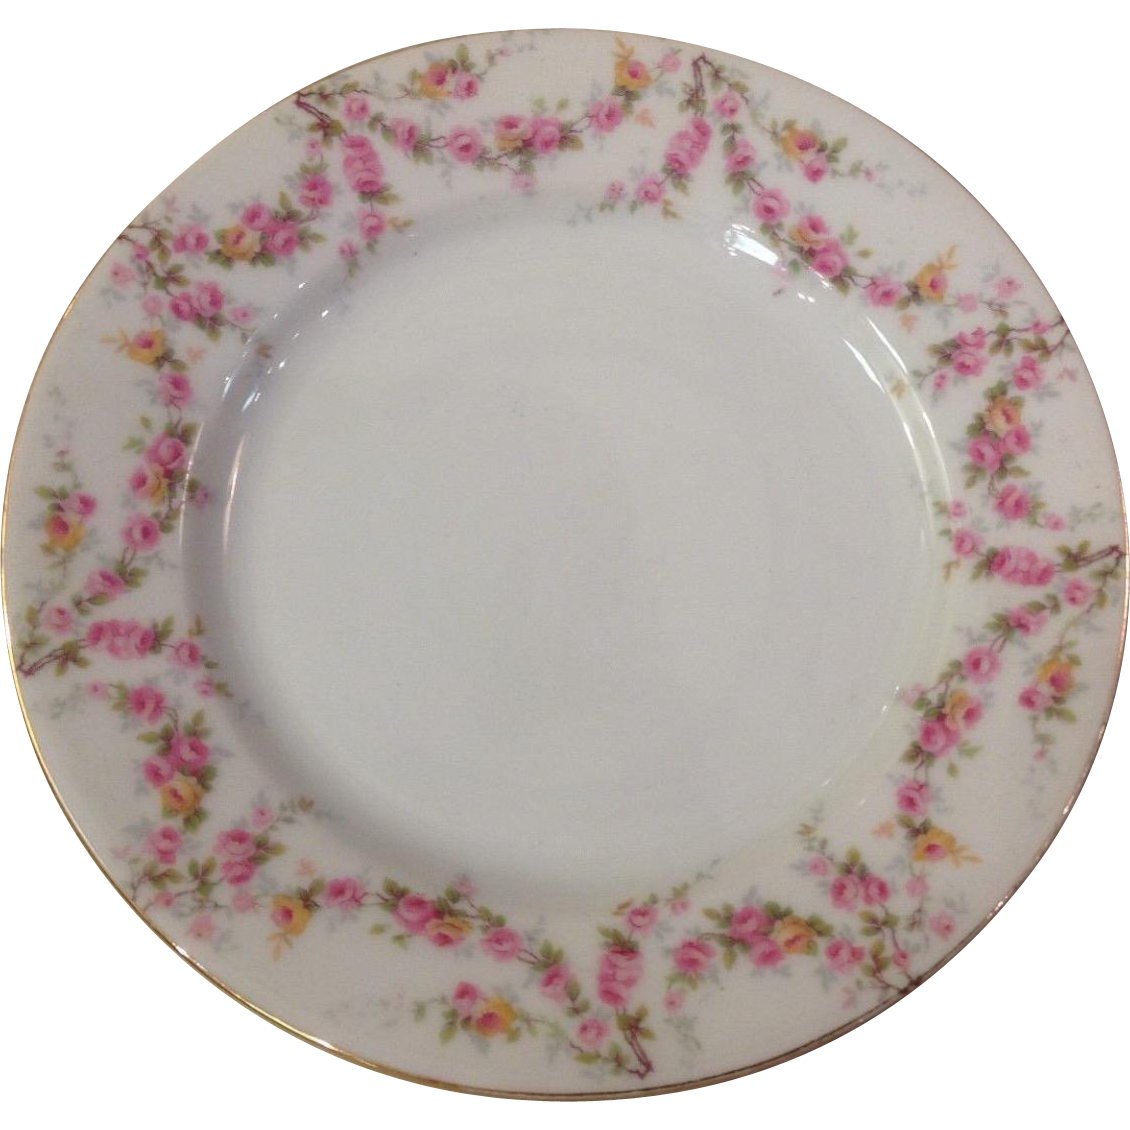 Royal Schwarzburg China RSC15 Salad Plate Pink Rose Garland Design c.1915